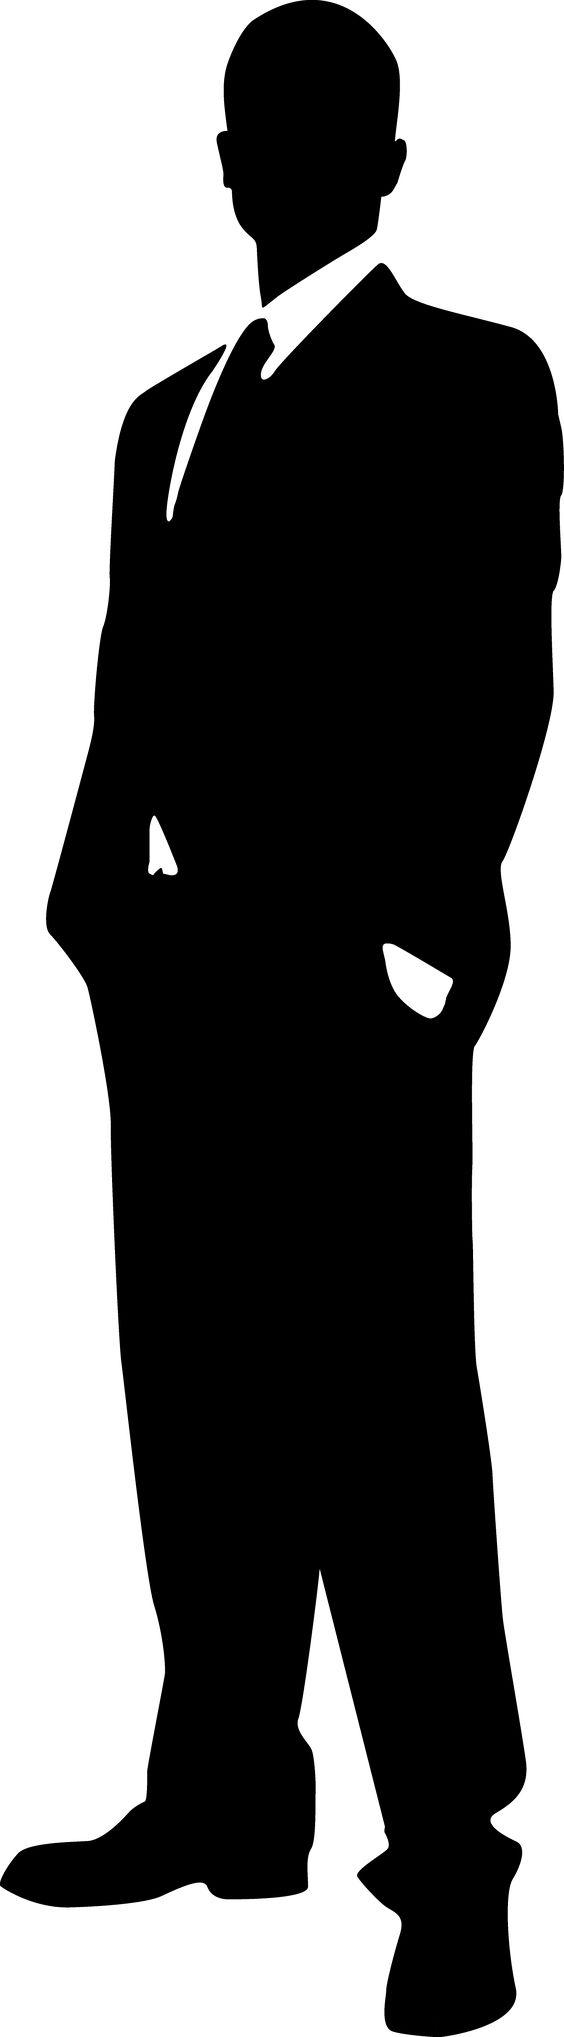 154962e90da7a62d7af535d762d221a7_man-silhouette-clip-art-bing-man-silhouette-clipart_564-2037.jpeg